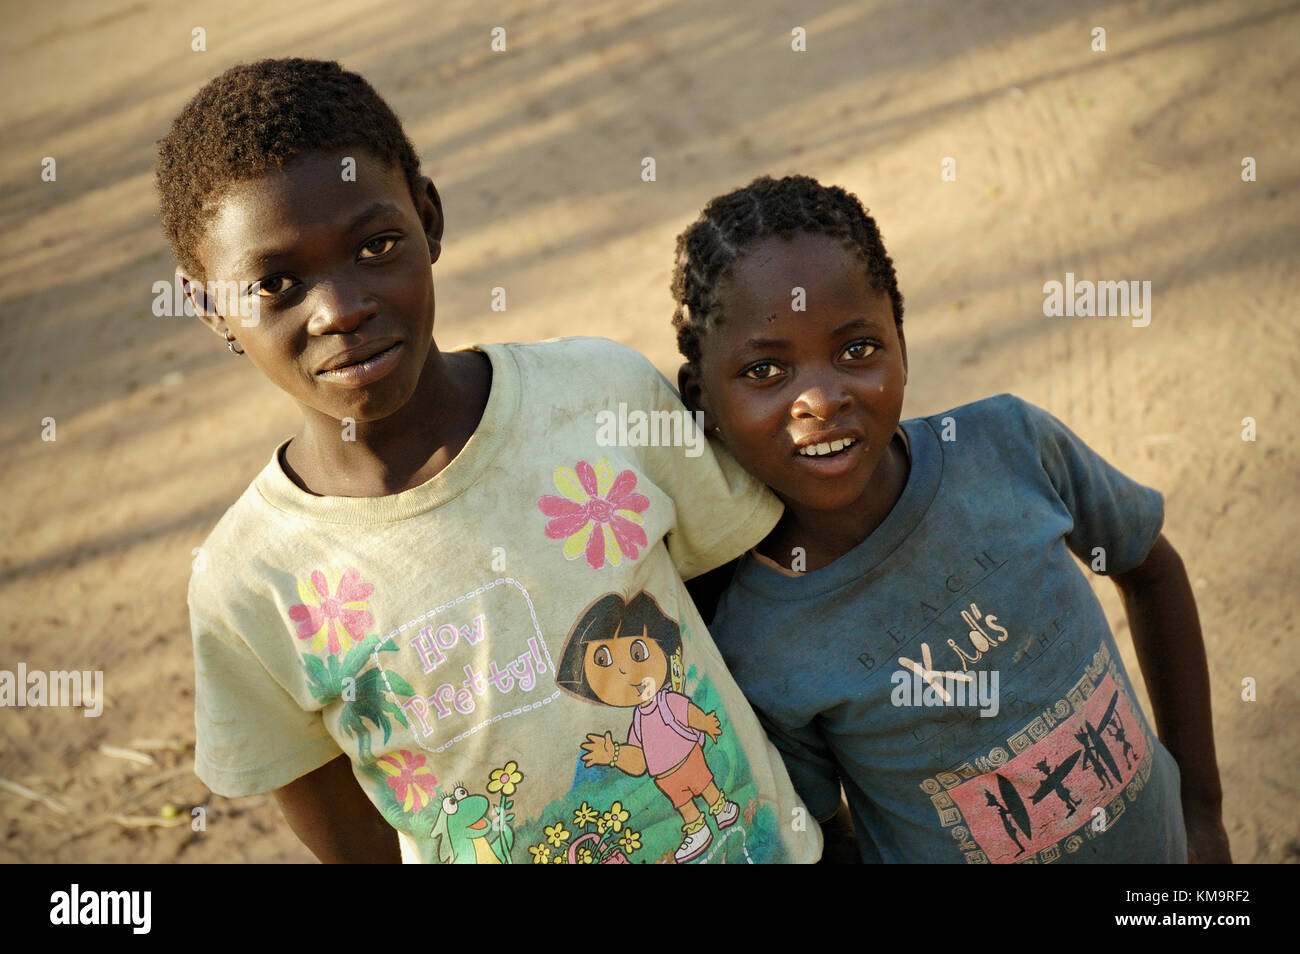 Two girls in Kawaza village, Eastern Province, Zambia - Stock Image